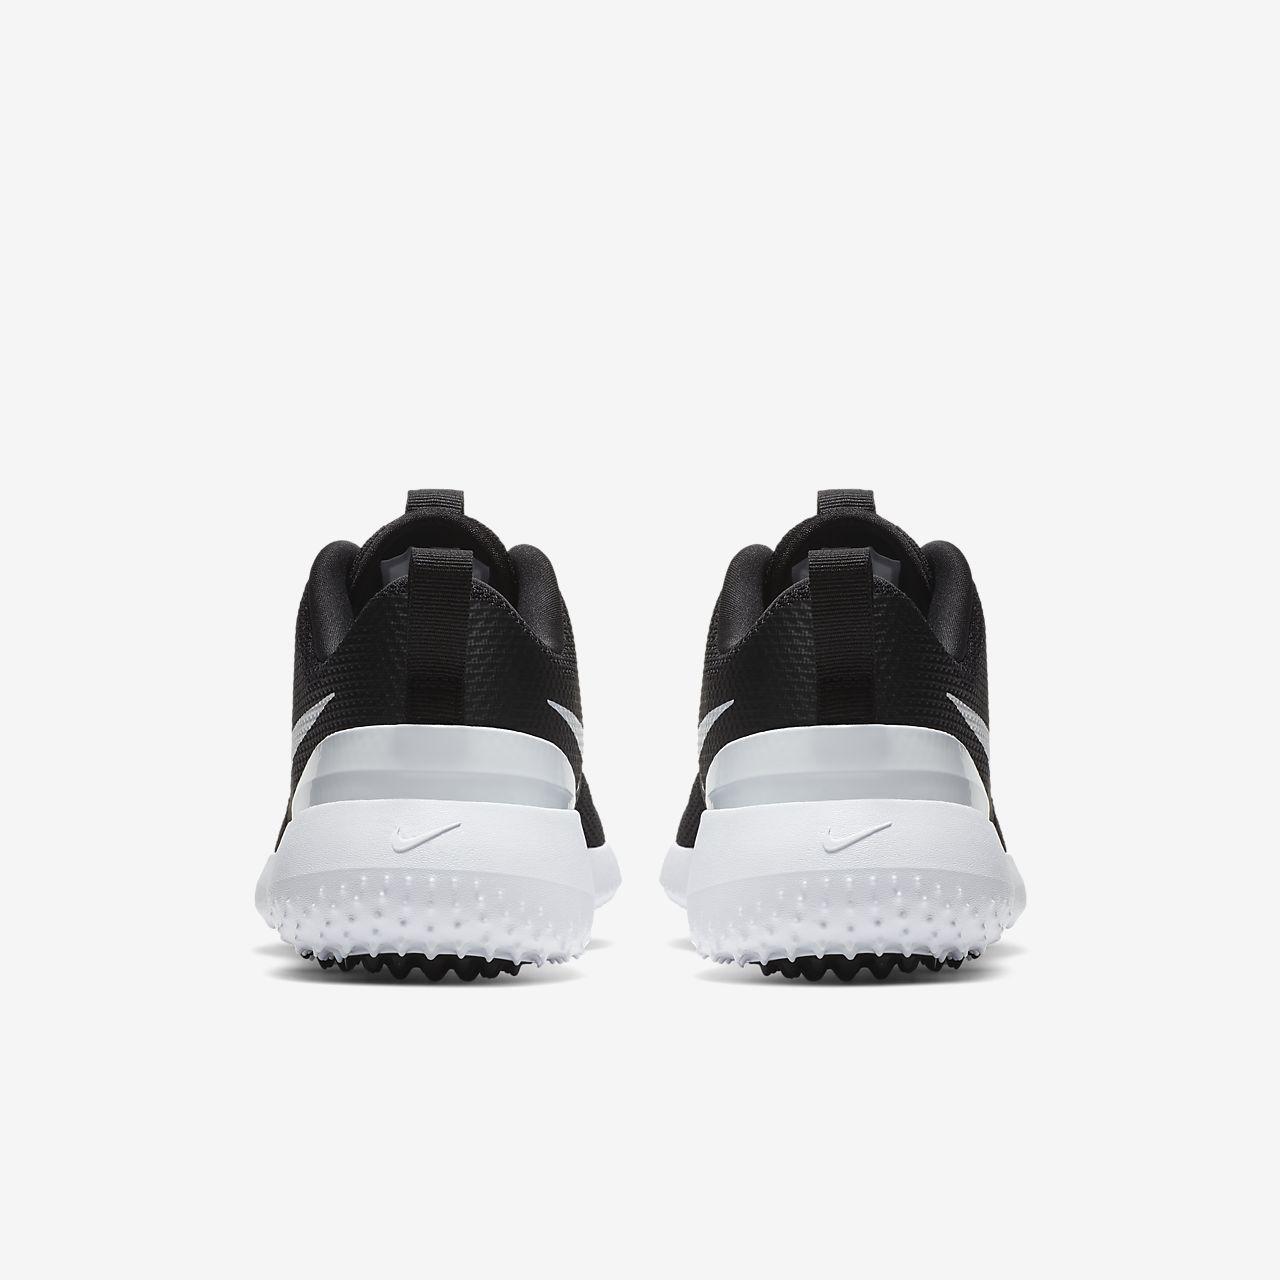 online retailer a50b2 ab9eb ... Chaussure de golf Nike Roshe G pour Femme